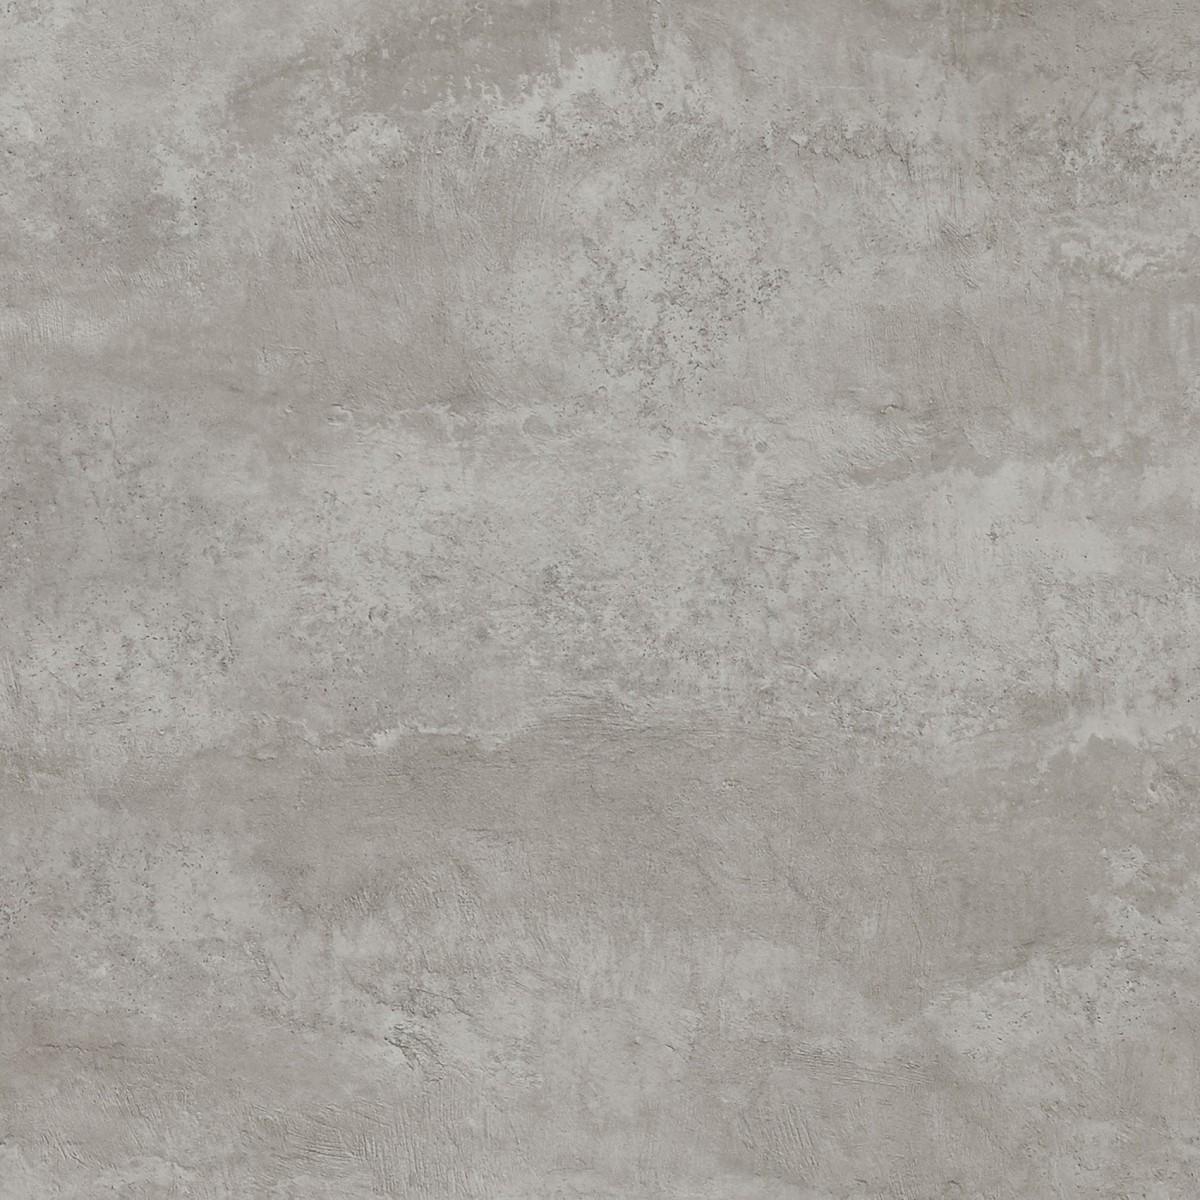 Столешница LuxeForm S529 Асканит 1U 28 4200 600